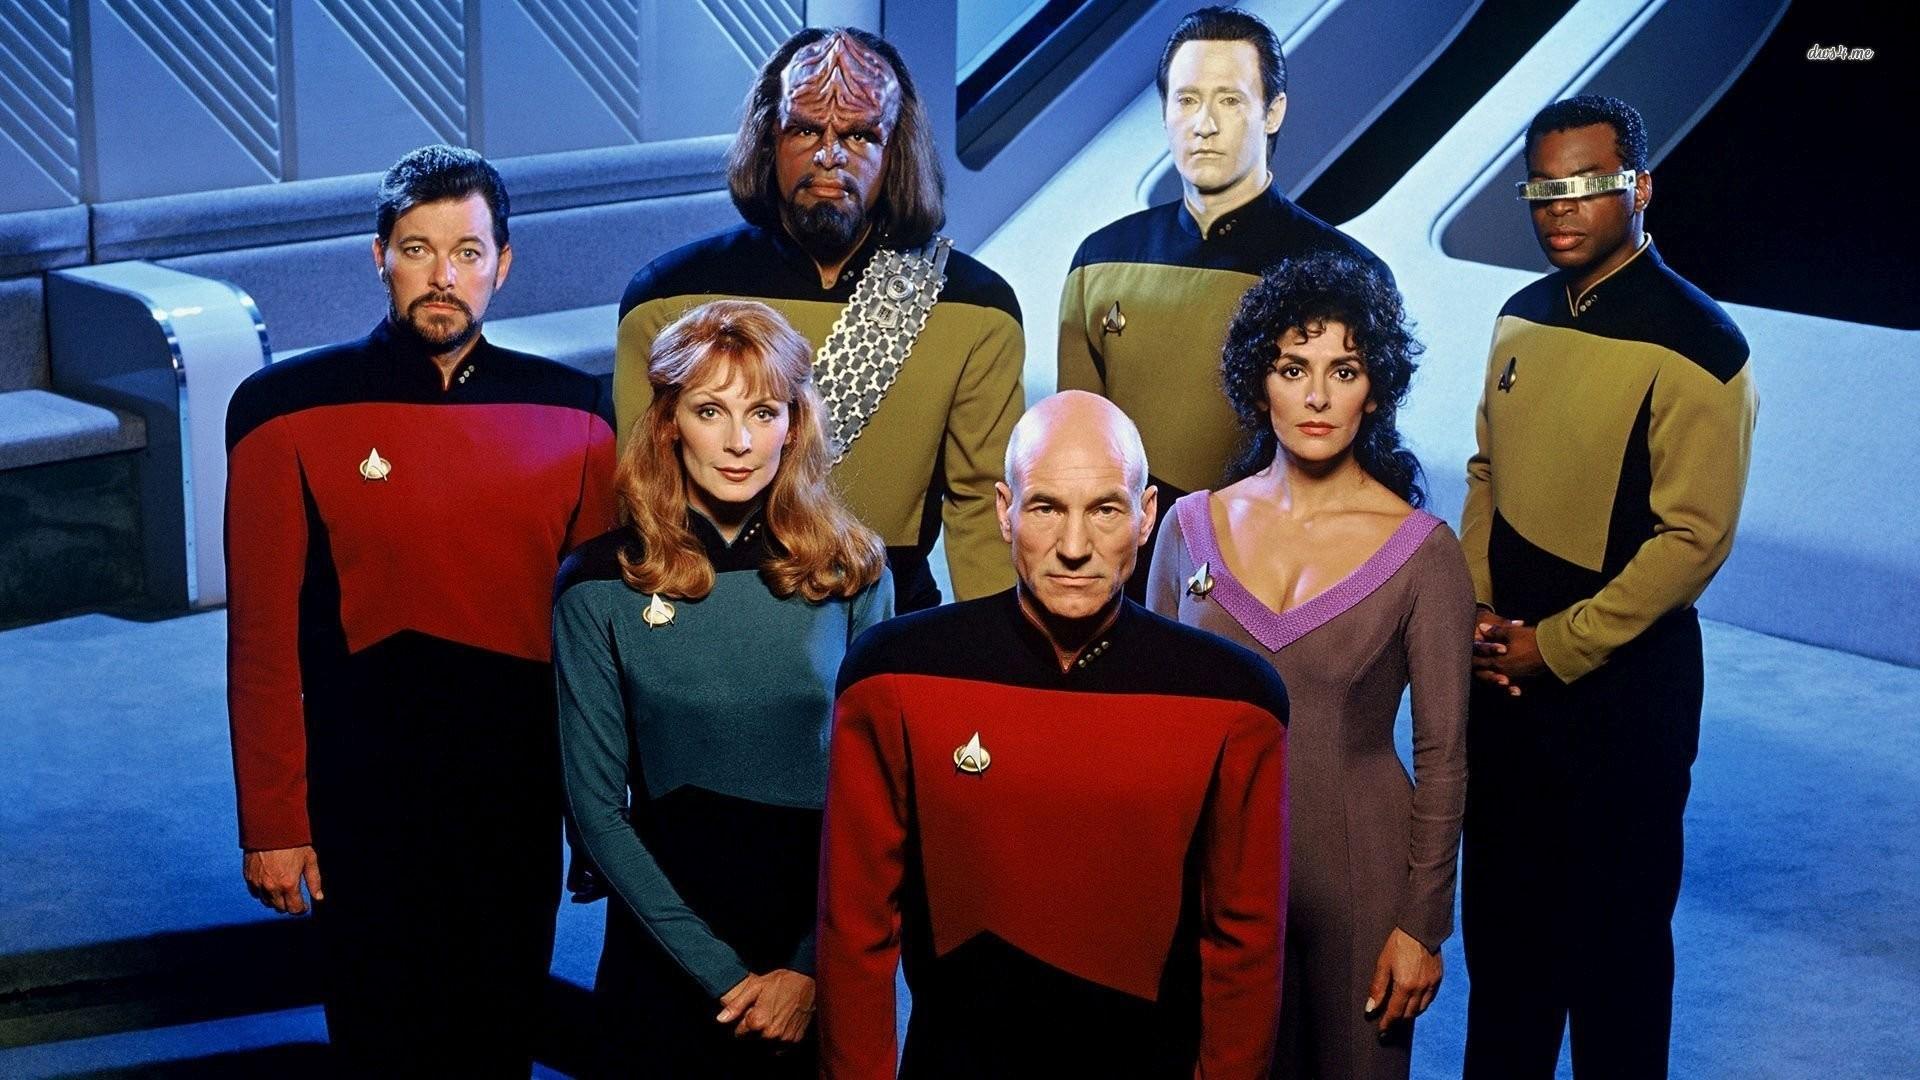 Star Trek The Next Generation Wallpaper 69 Images